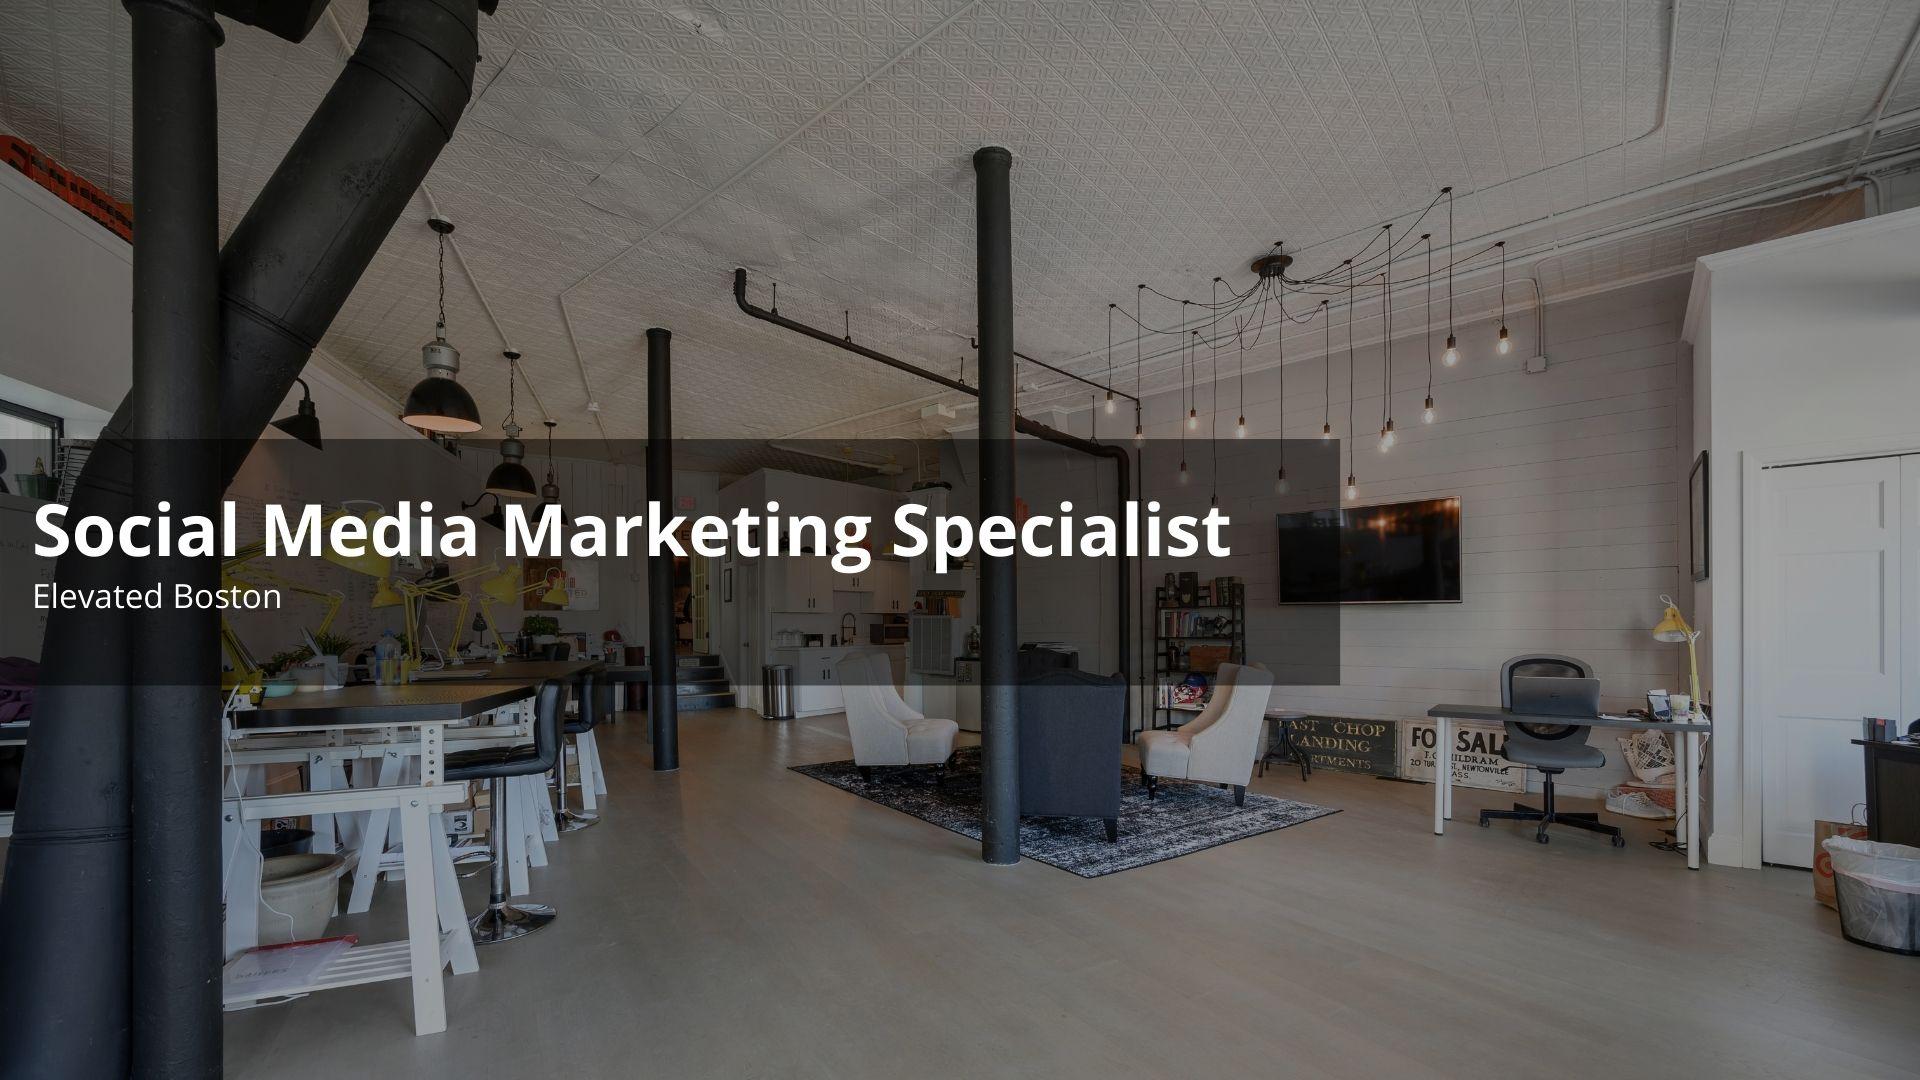 Social Media Marketing Specialist: Elevated Boston